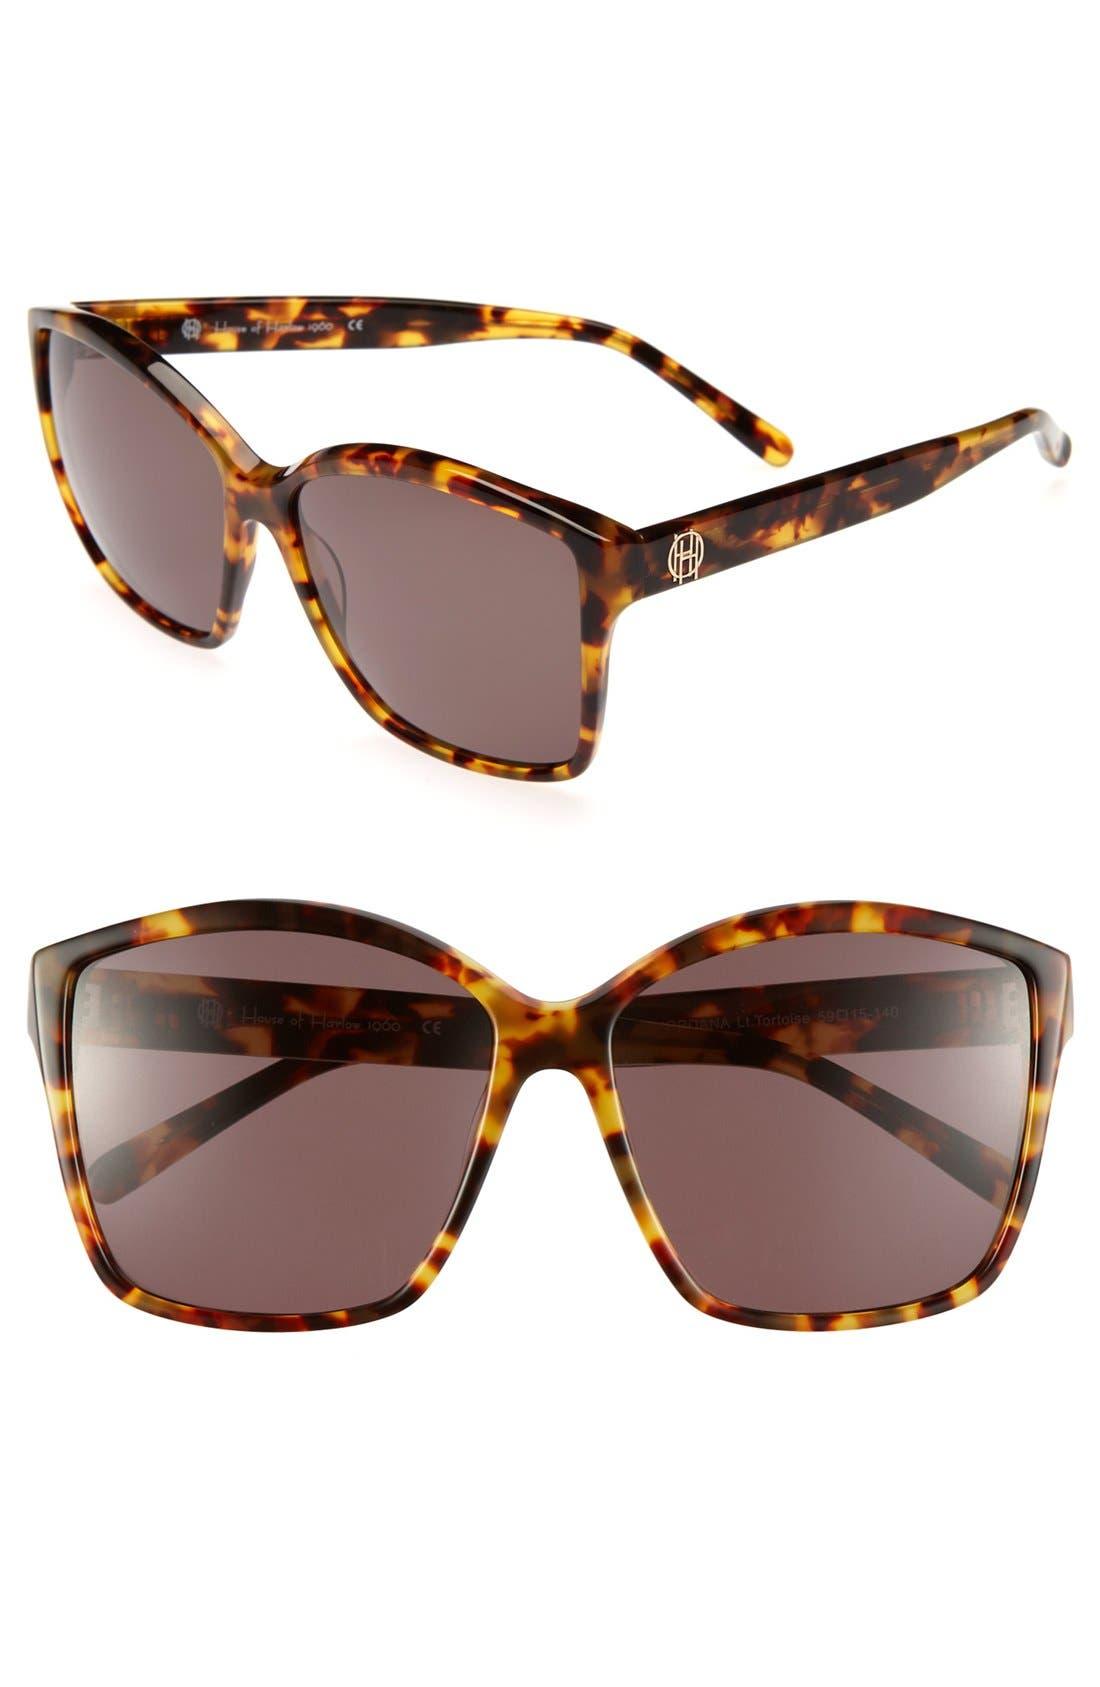 Main Image - House of Harlow 1960 'Jordana' 59mm Sunglasses